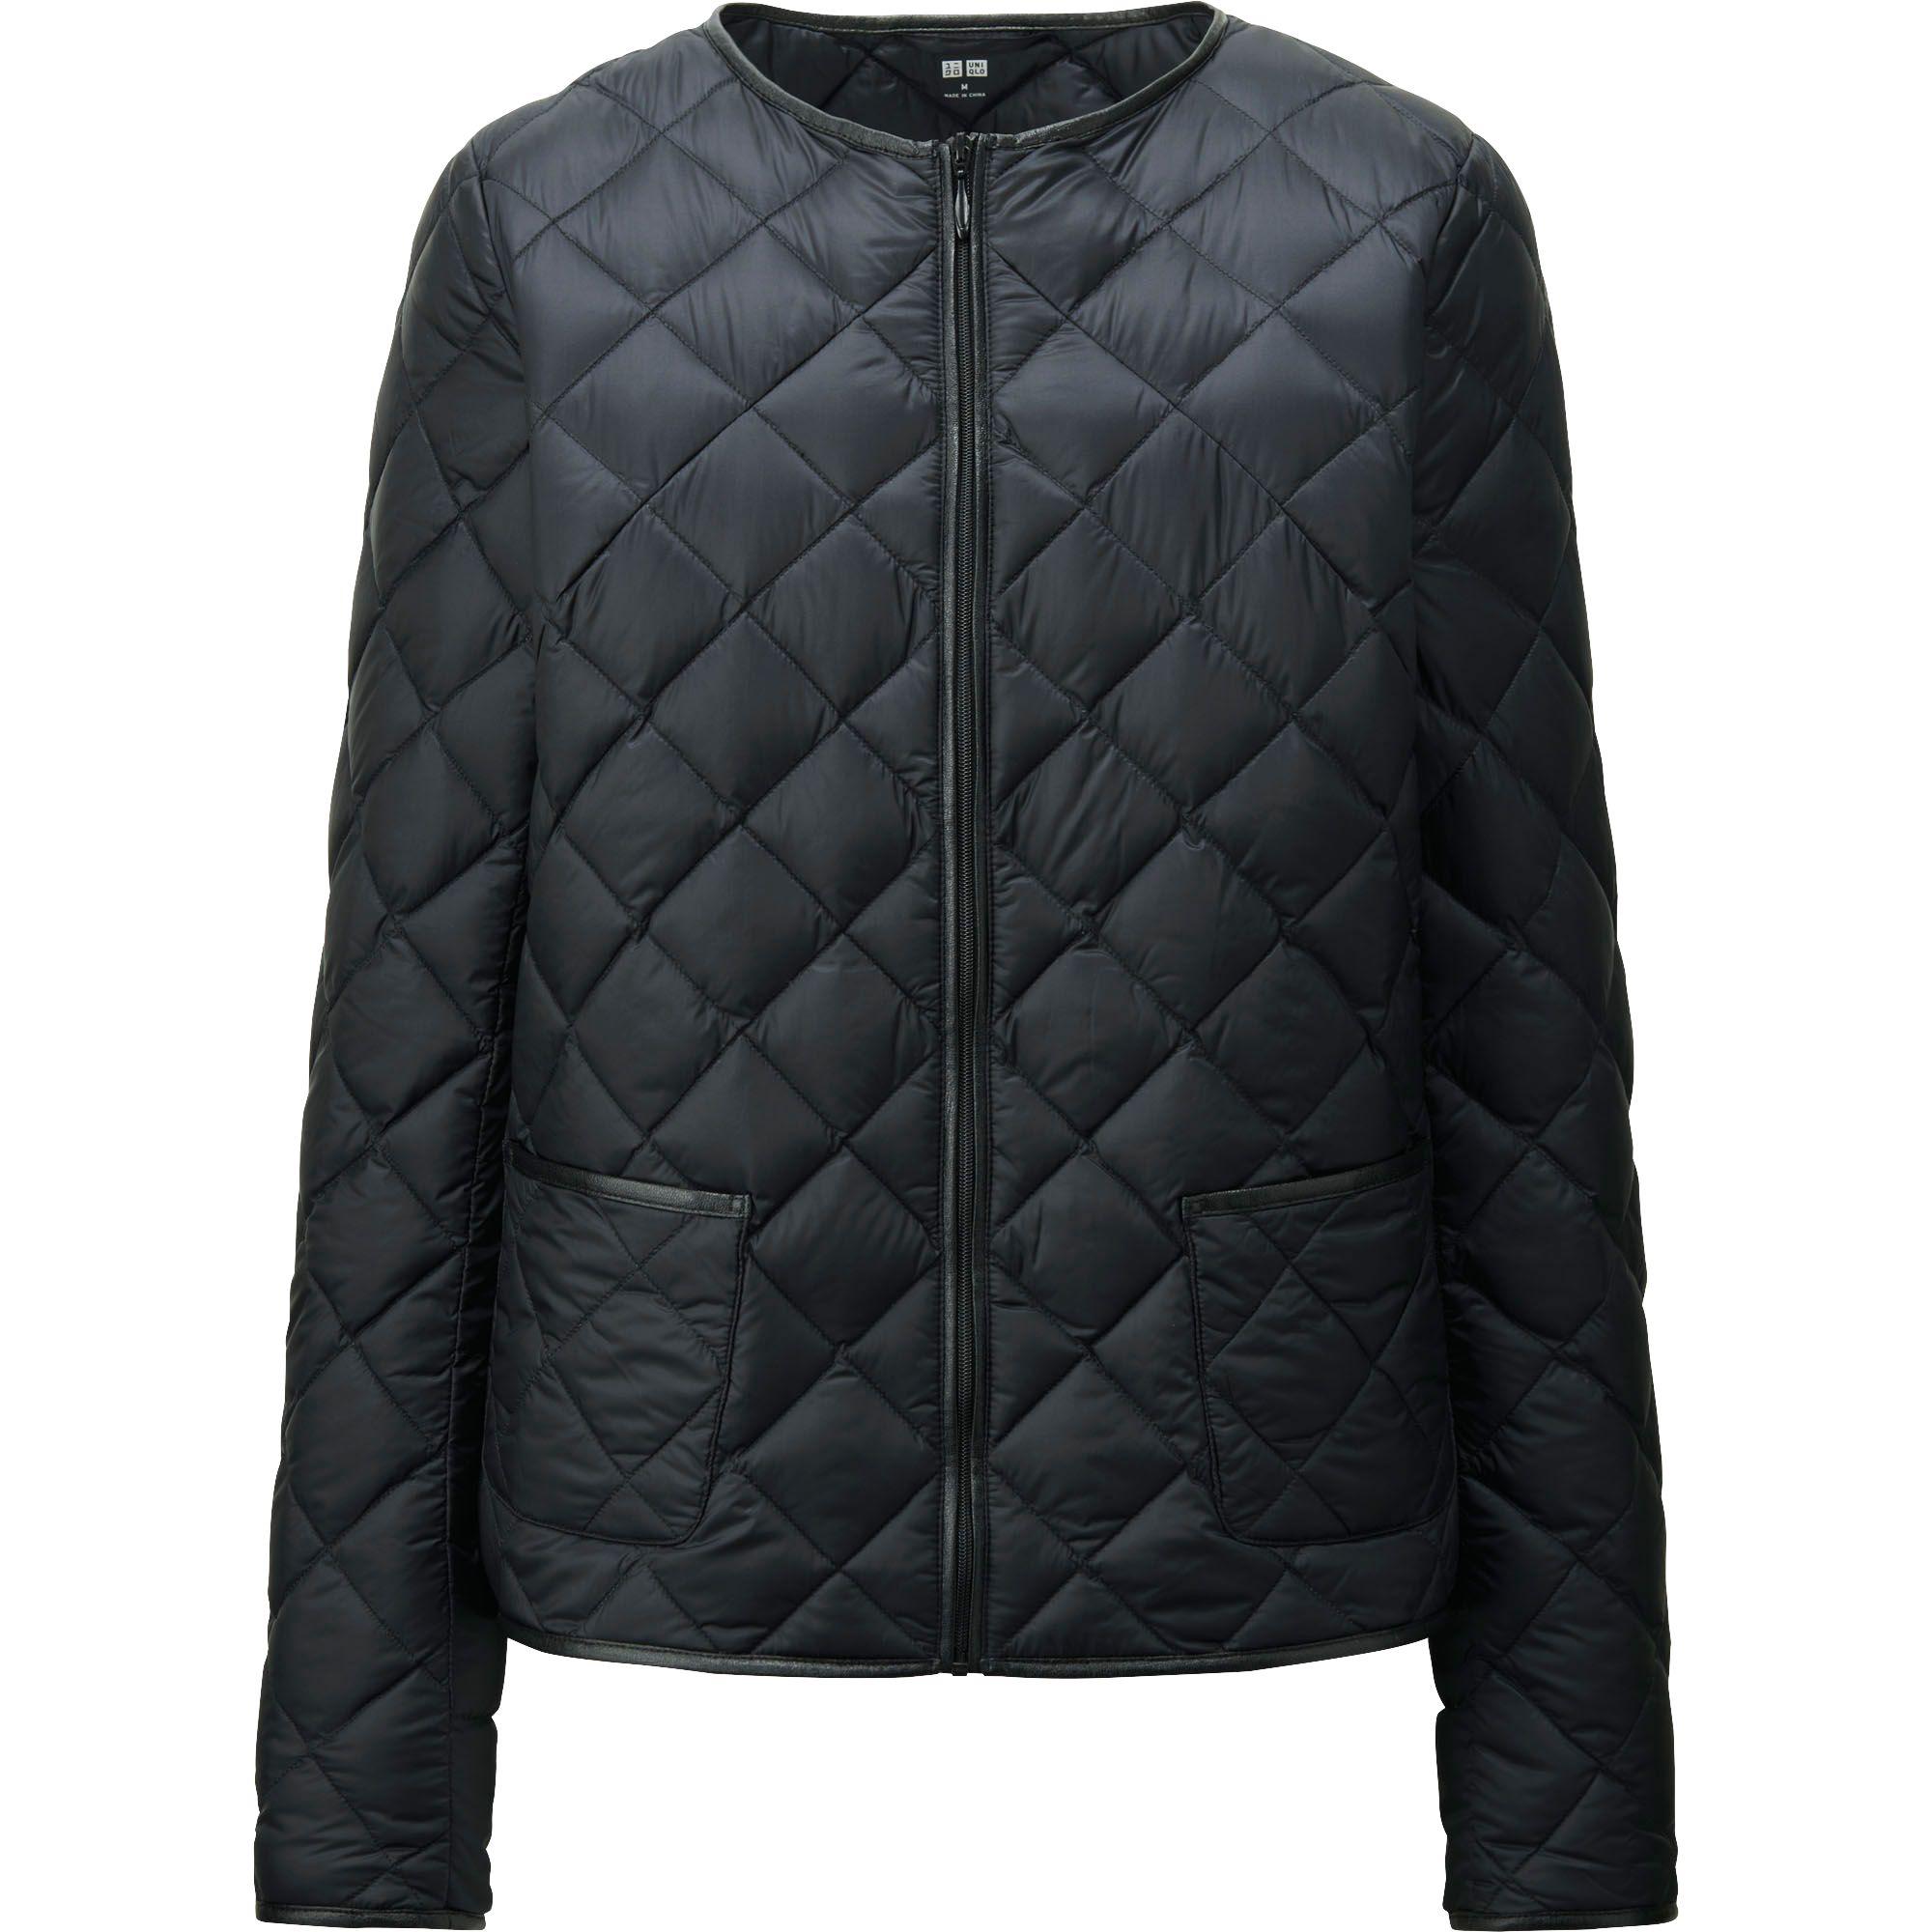 Uniqlo Women Ultra Light Down Collarless Jacket In Black